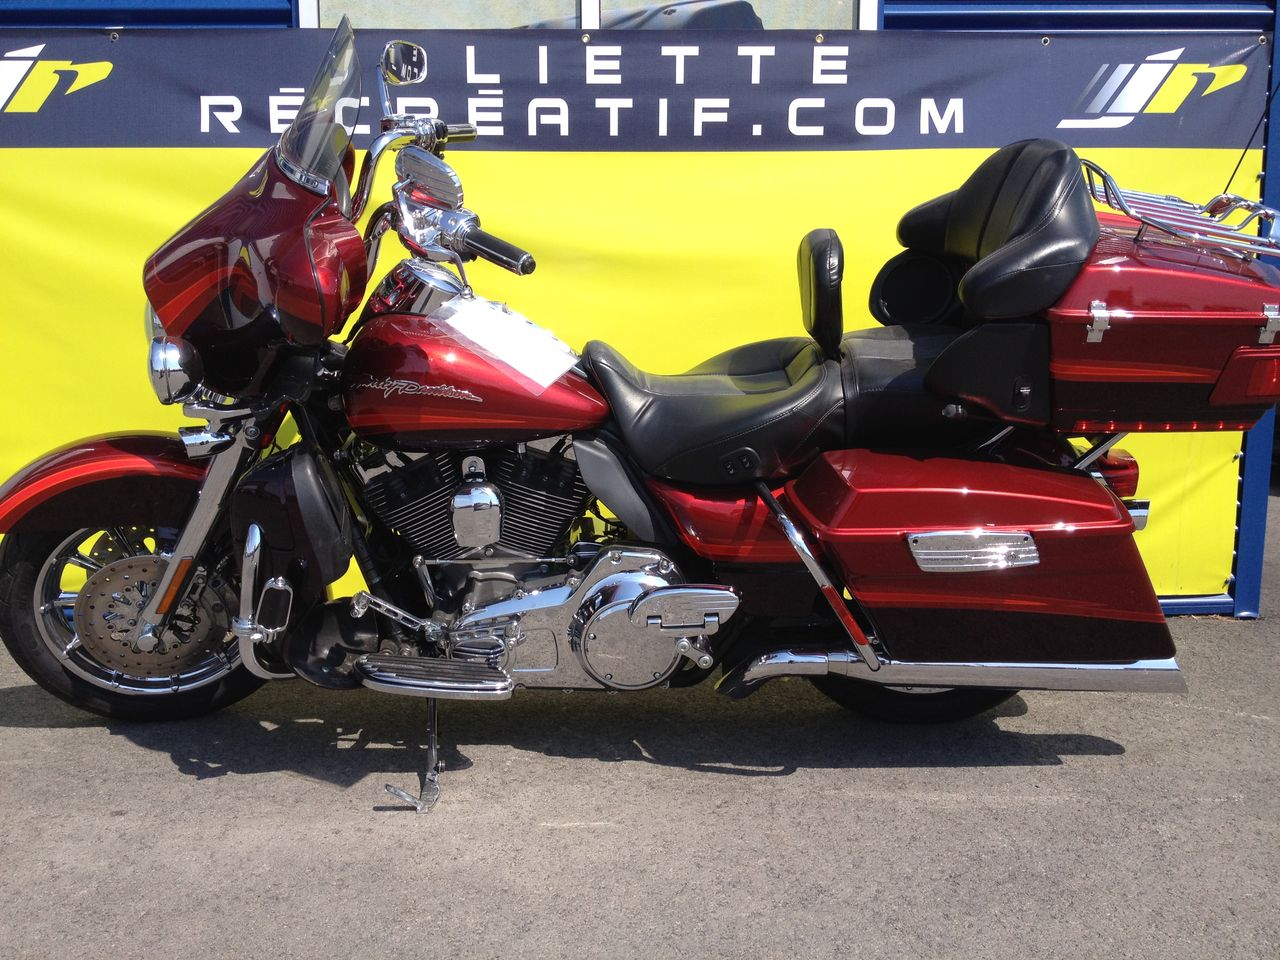 2009 Harley FLHTCUSE 21,995$